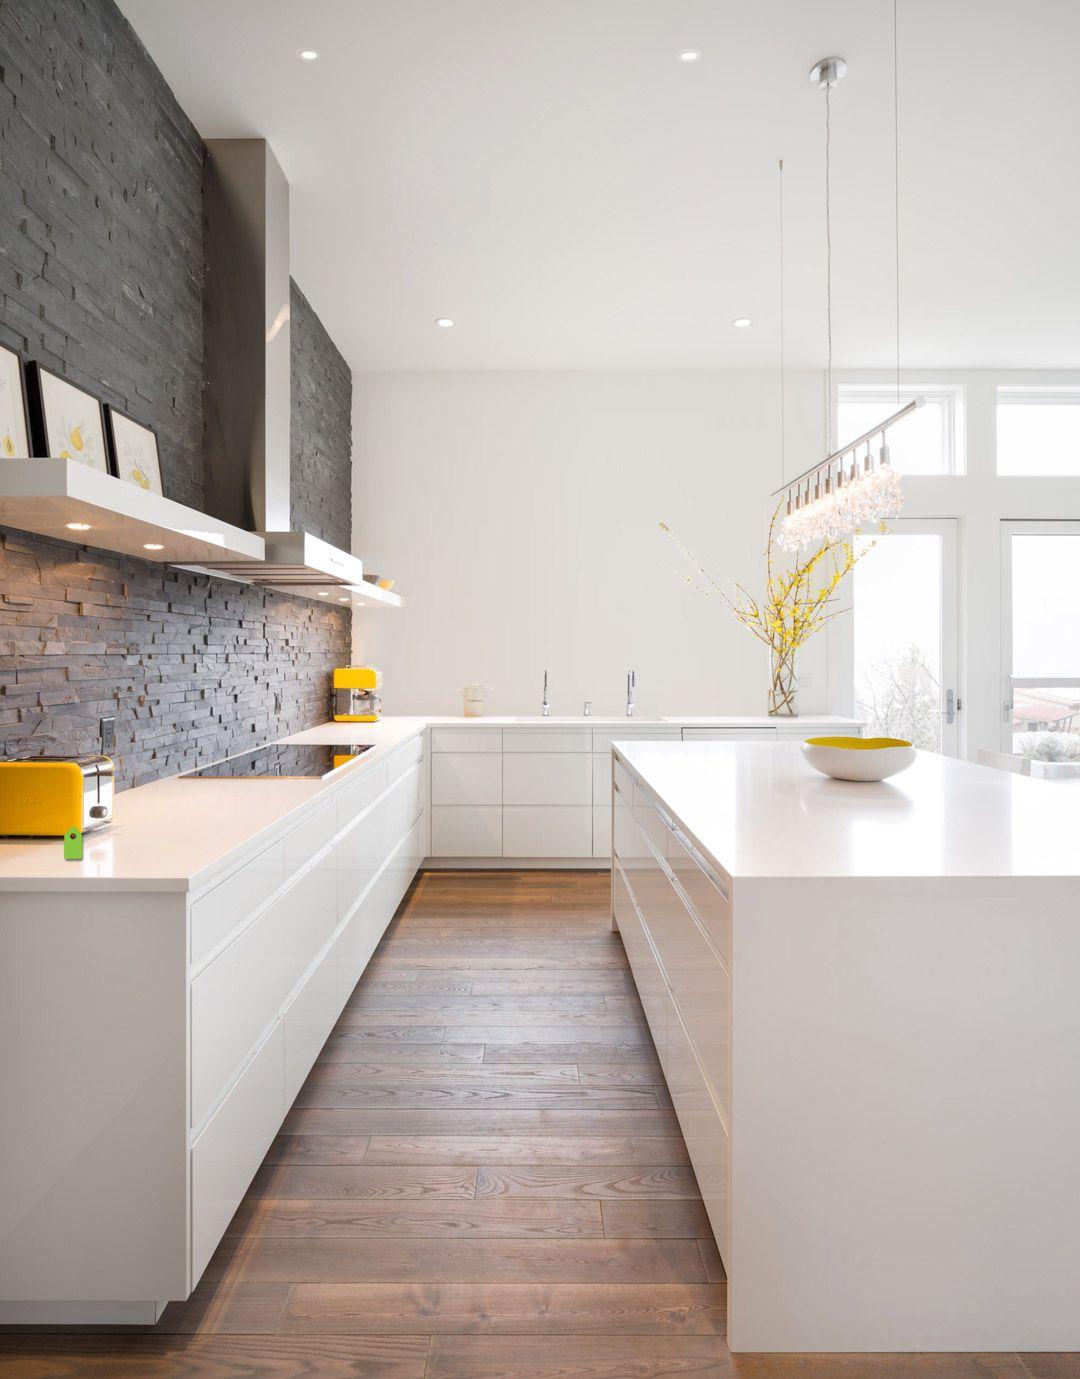 100 idee di cucine moderne con elementi in legno | Pinterest | Küche